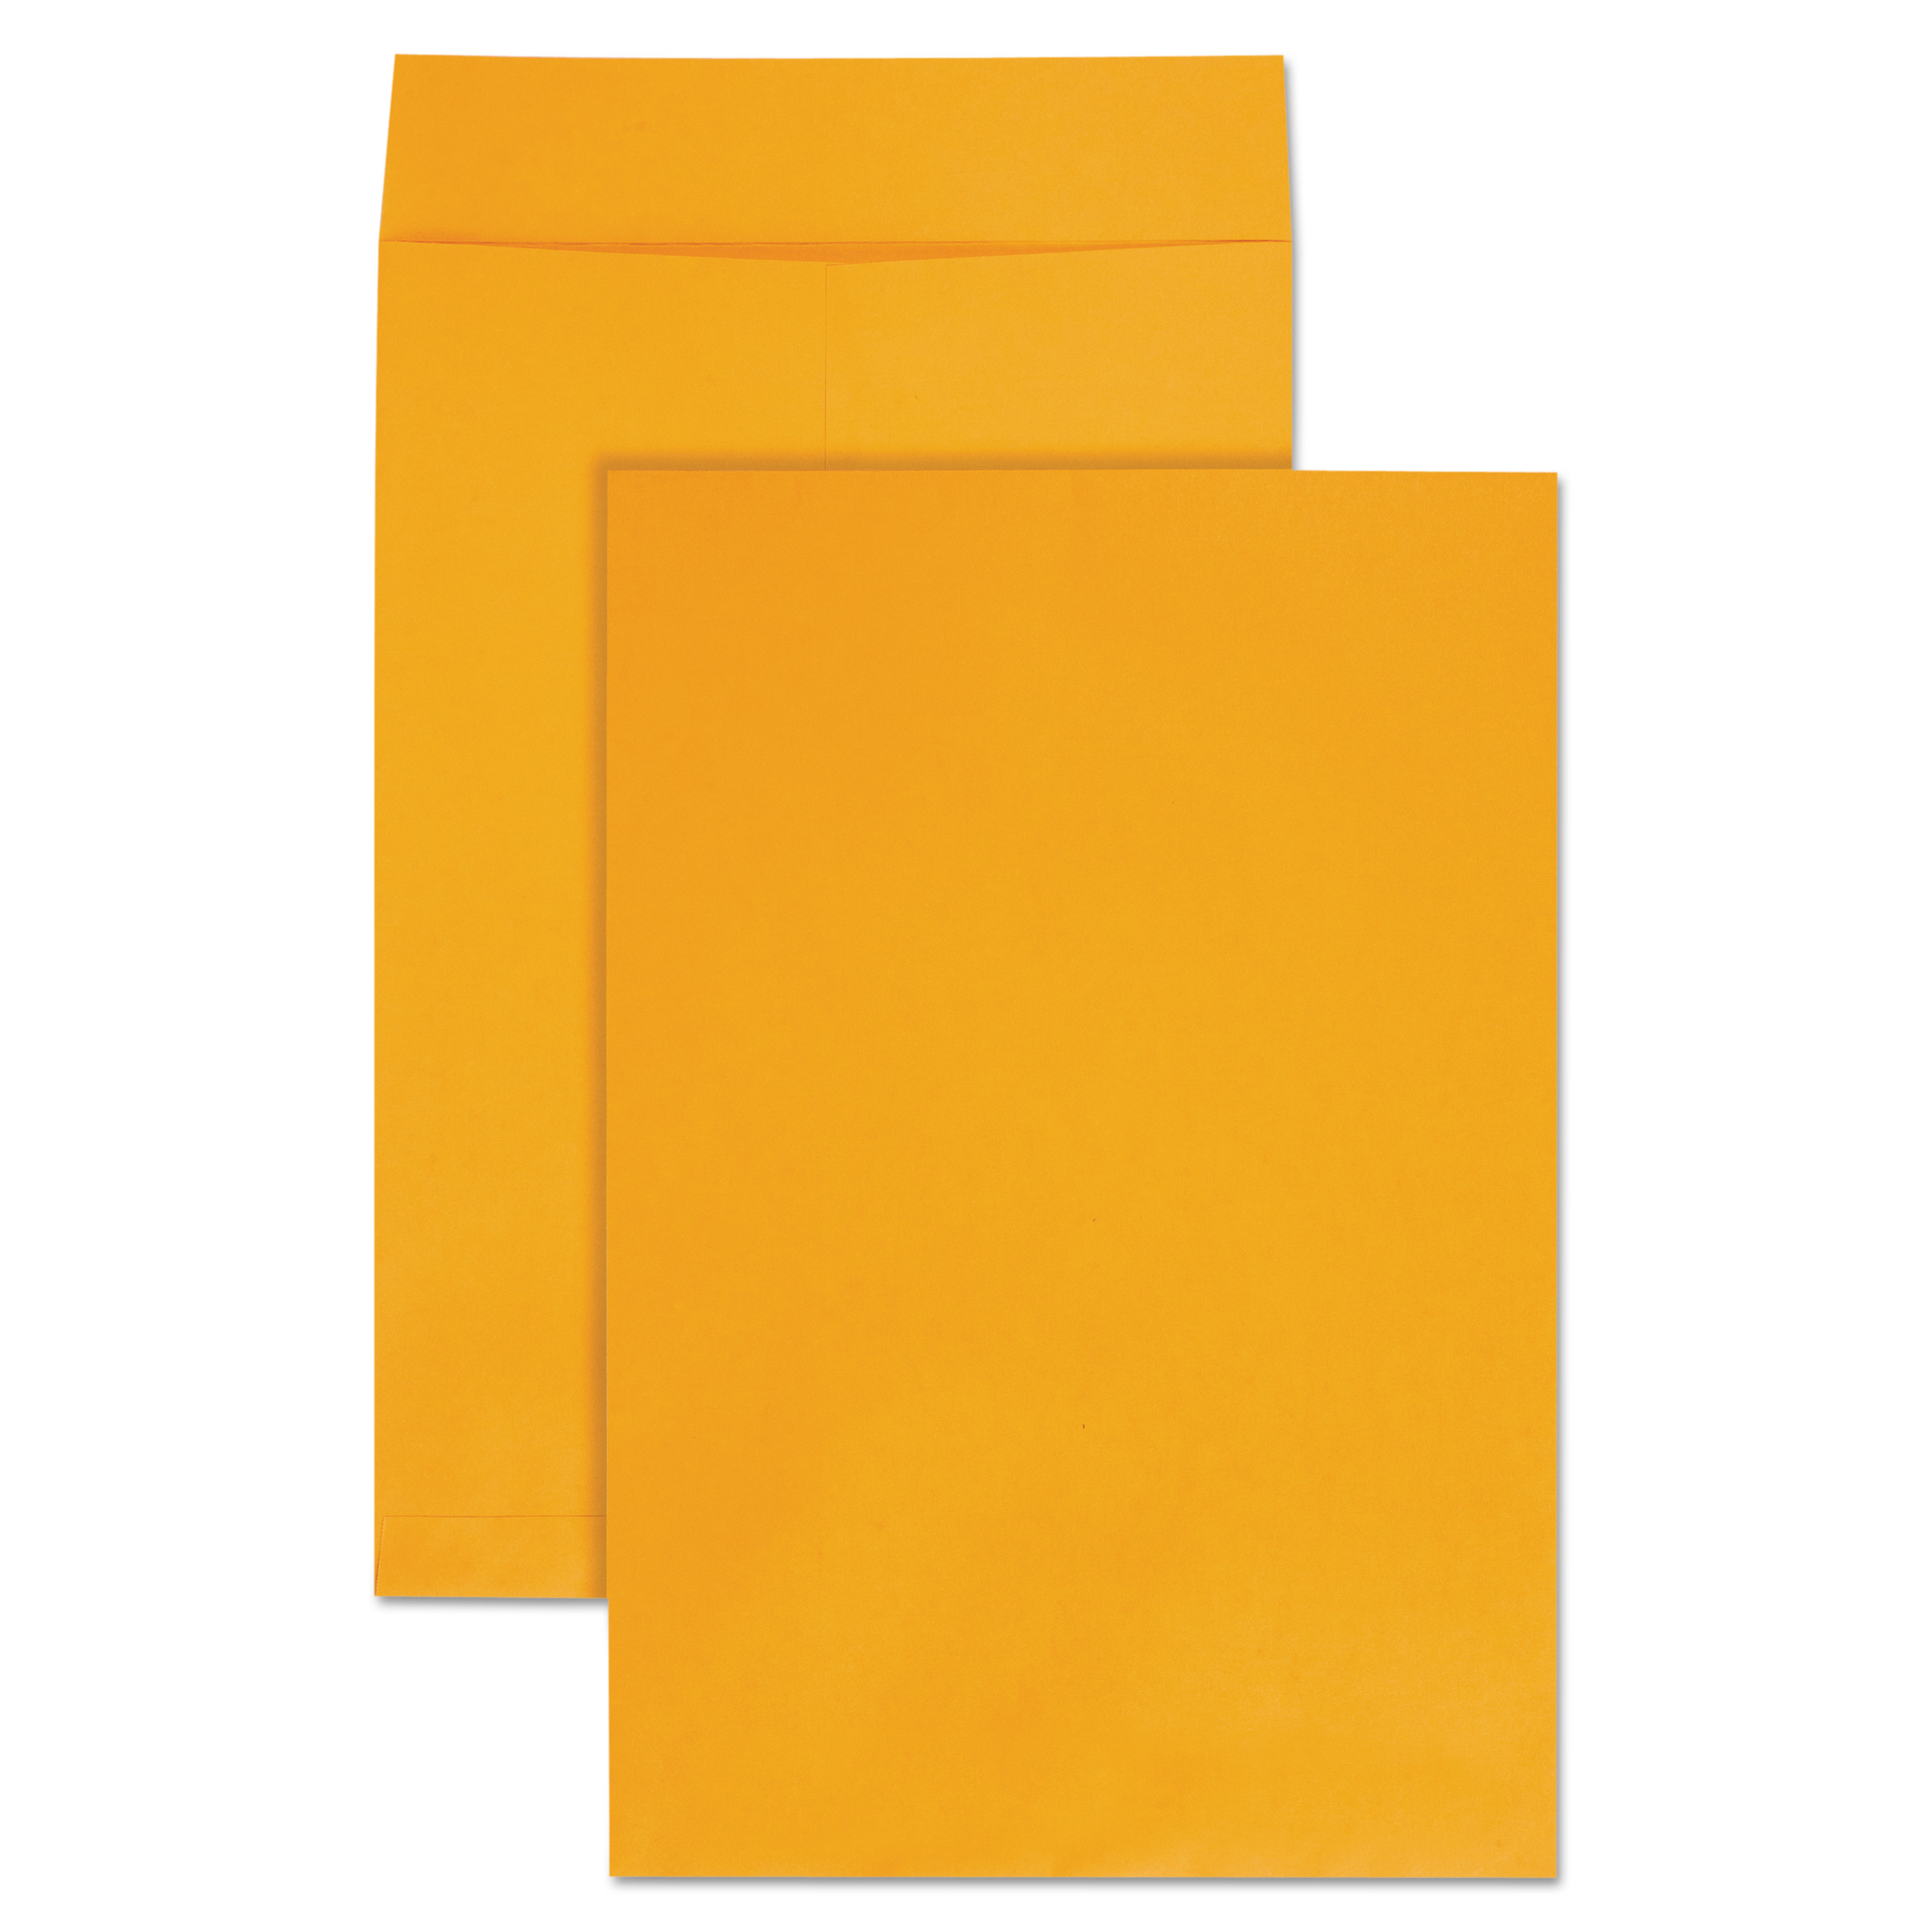 Quality Park Jumbo Size Kraft Envelope, 12 1/2 x 18 1/2, Brown Kraft, 25/Pack -QUA42353